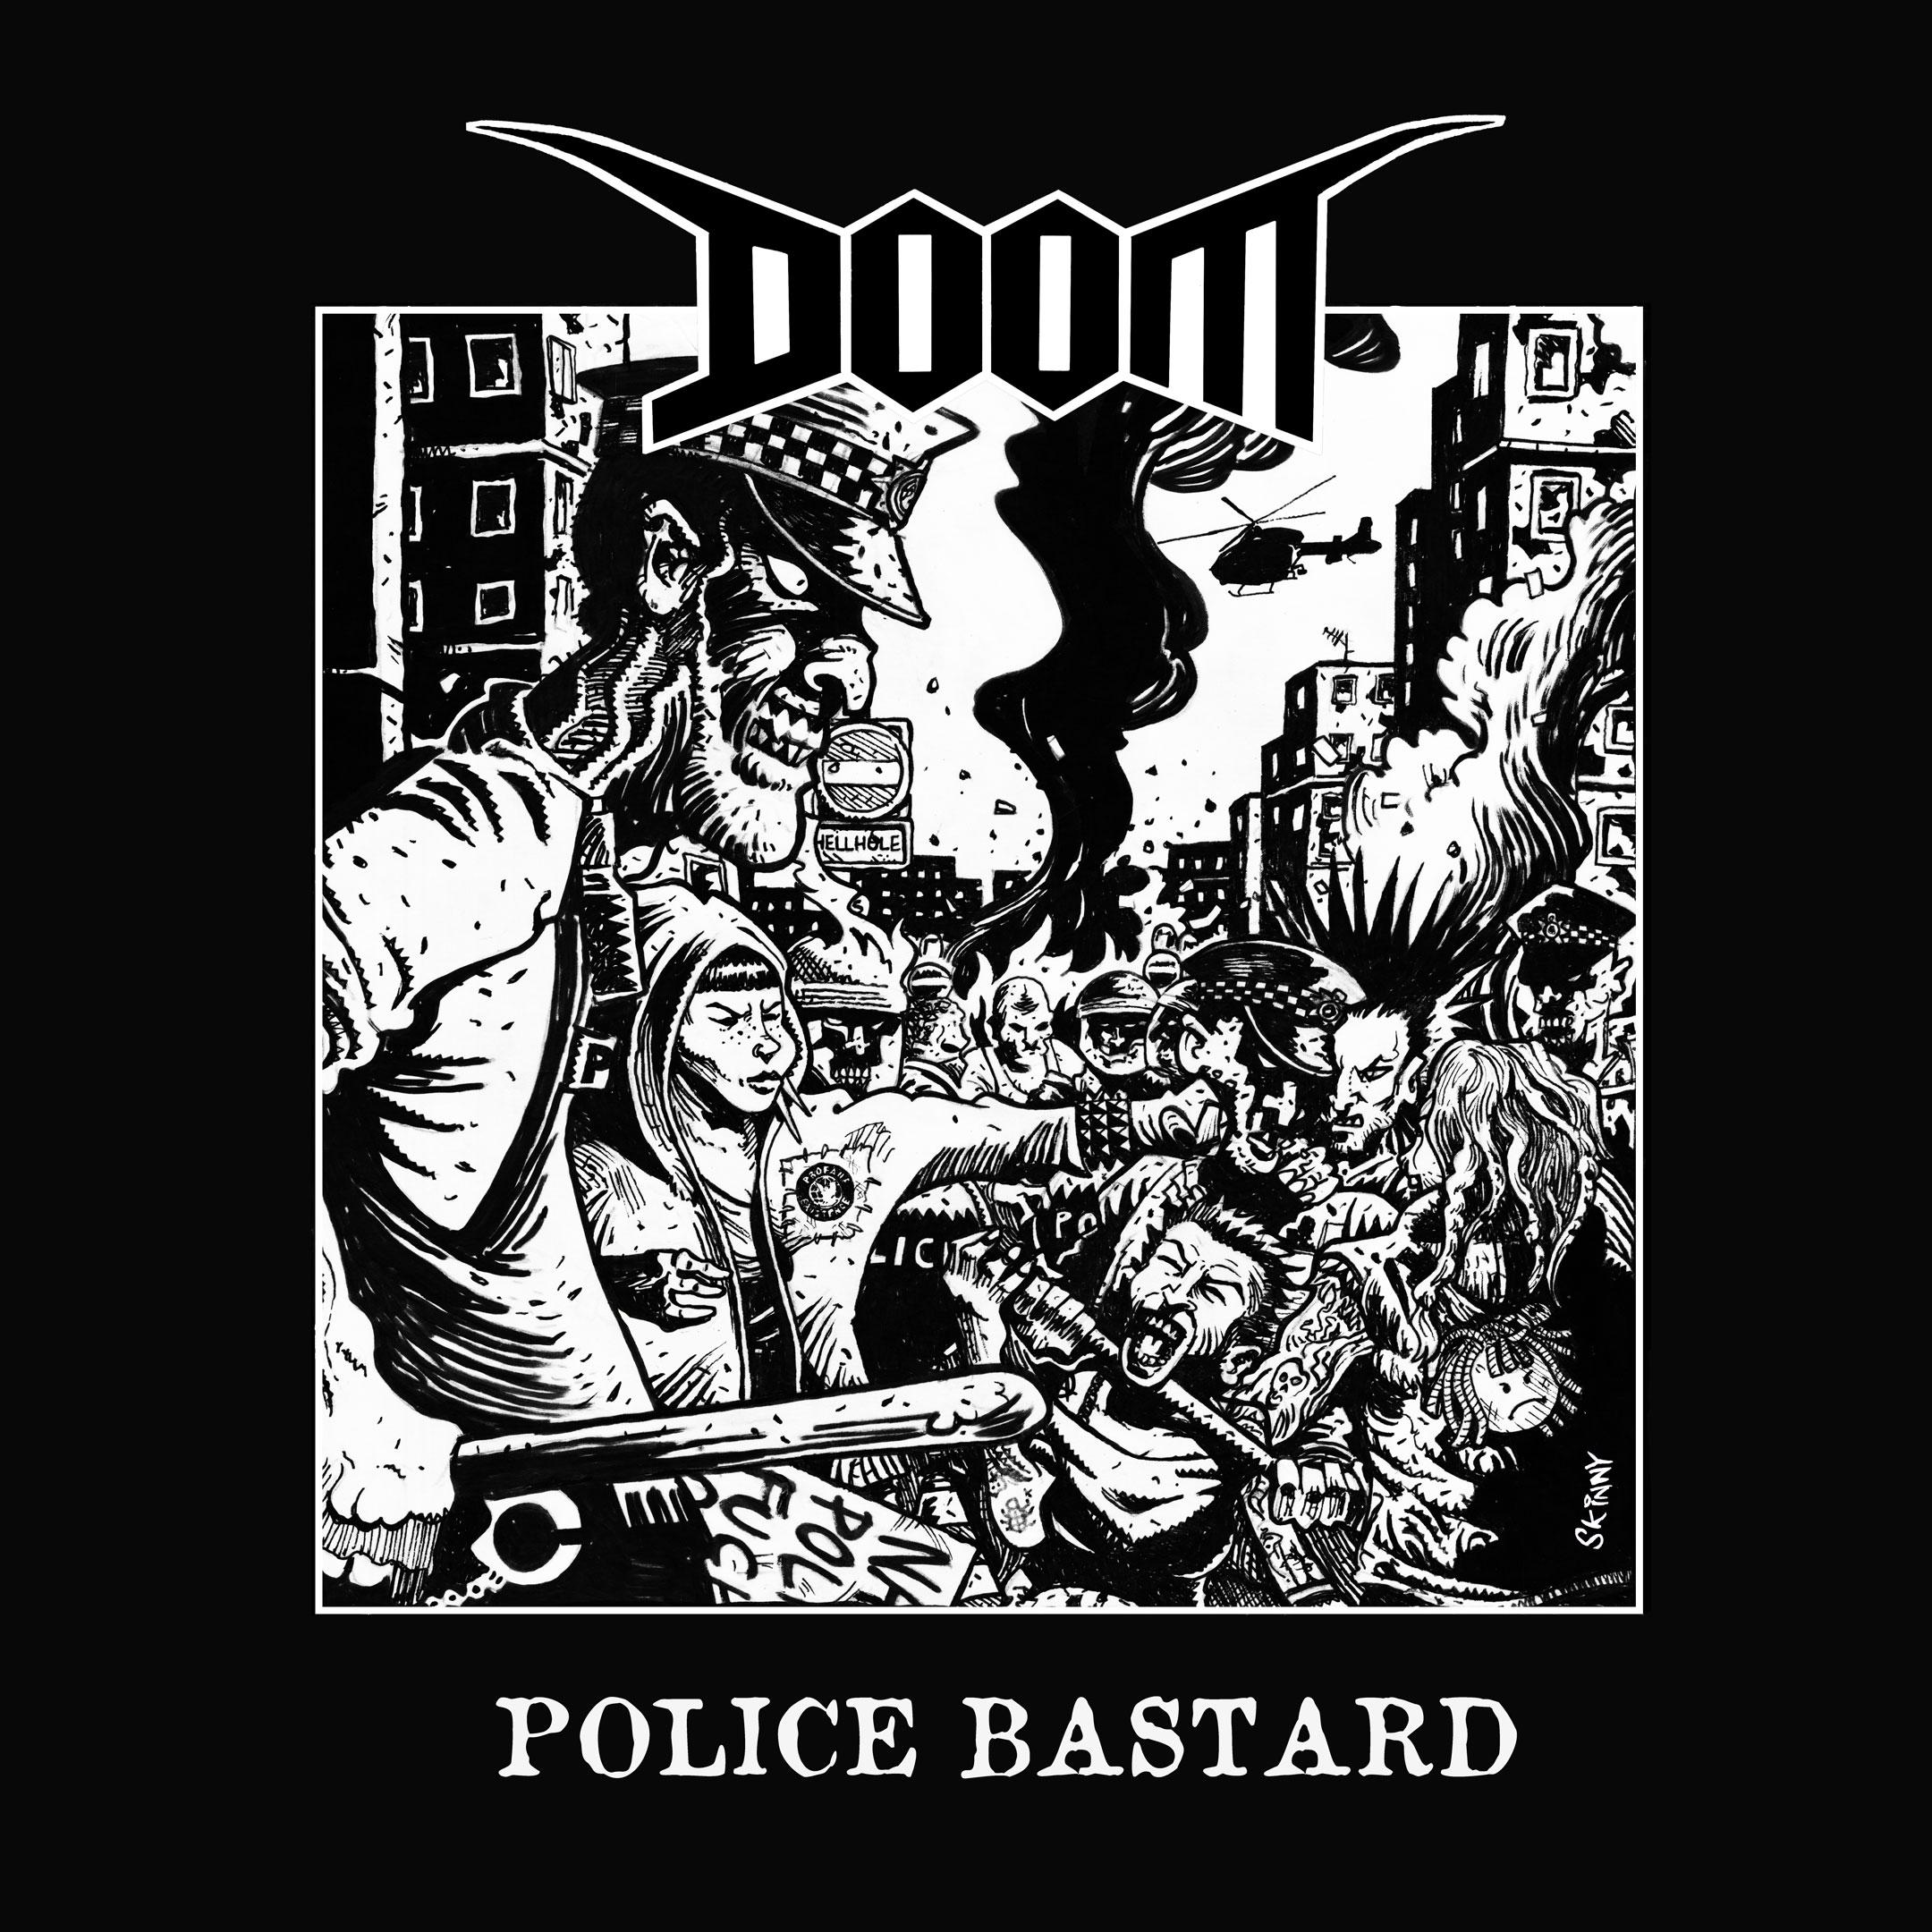 Doom - Police Bastard 7